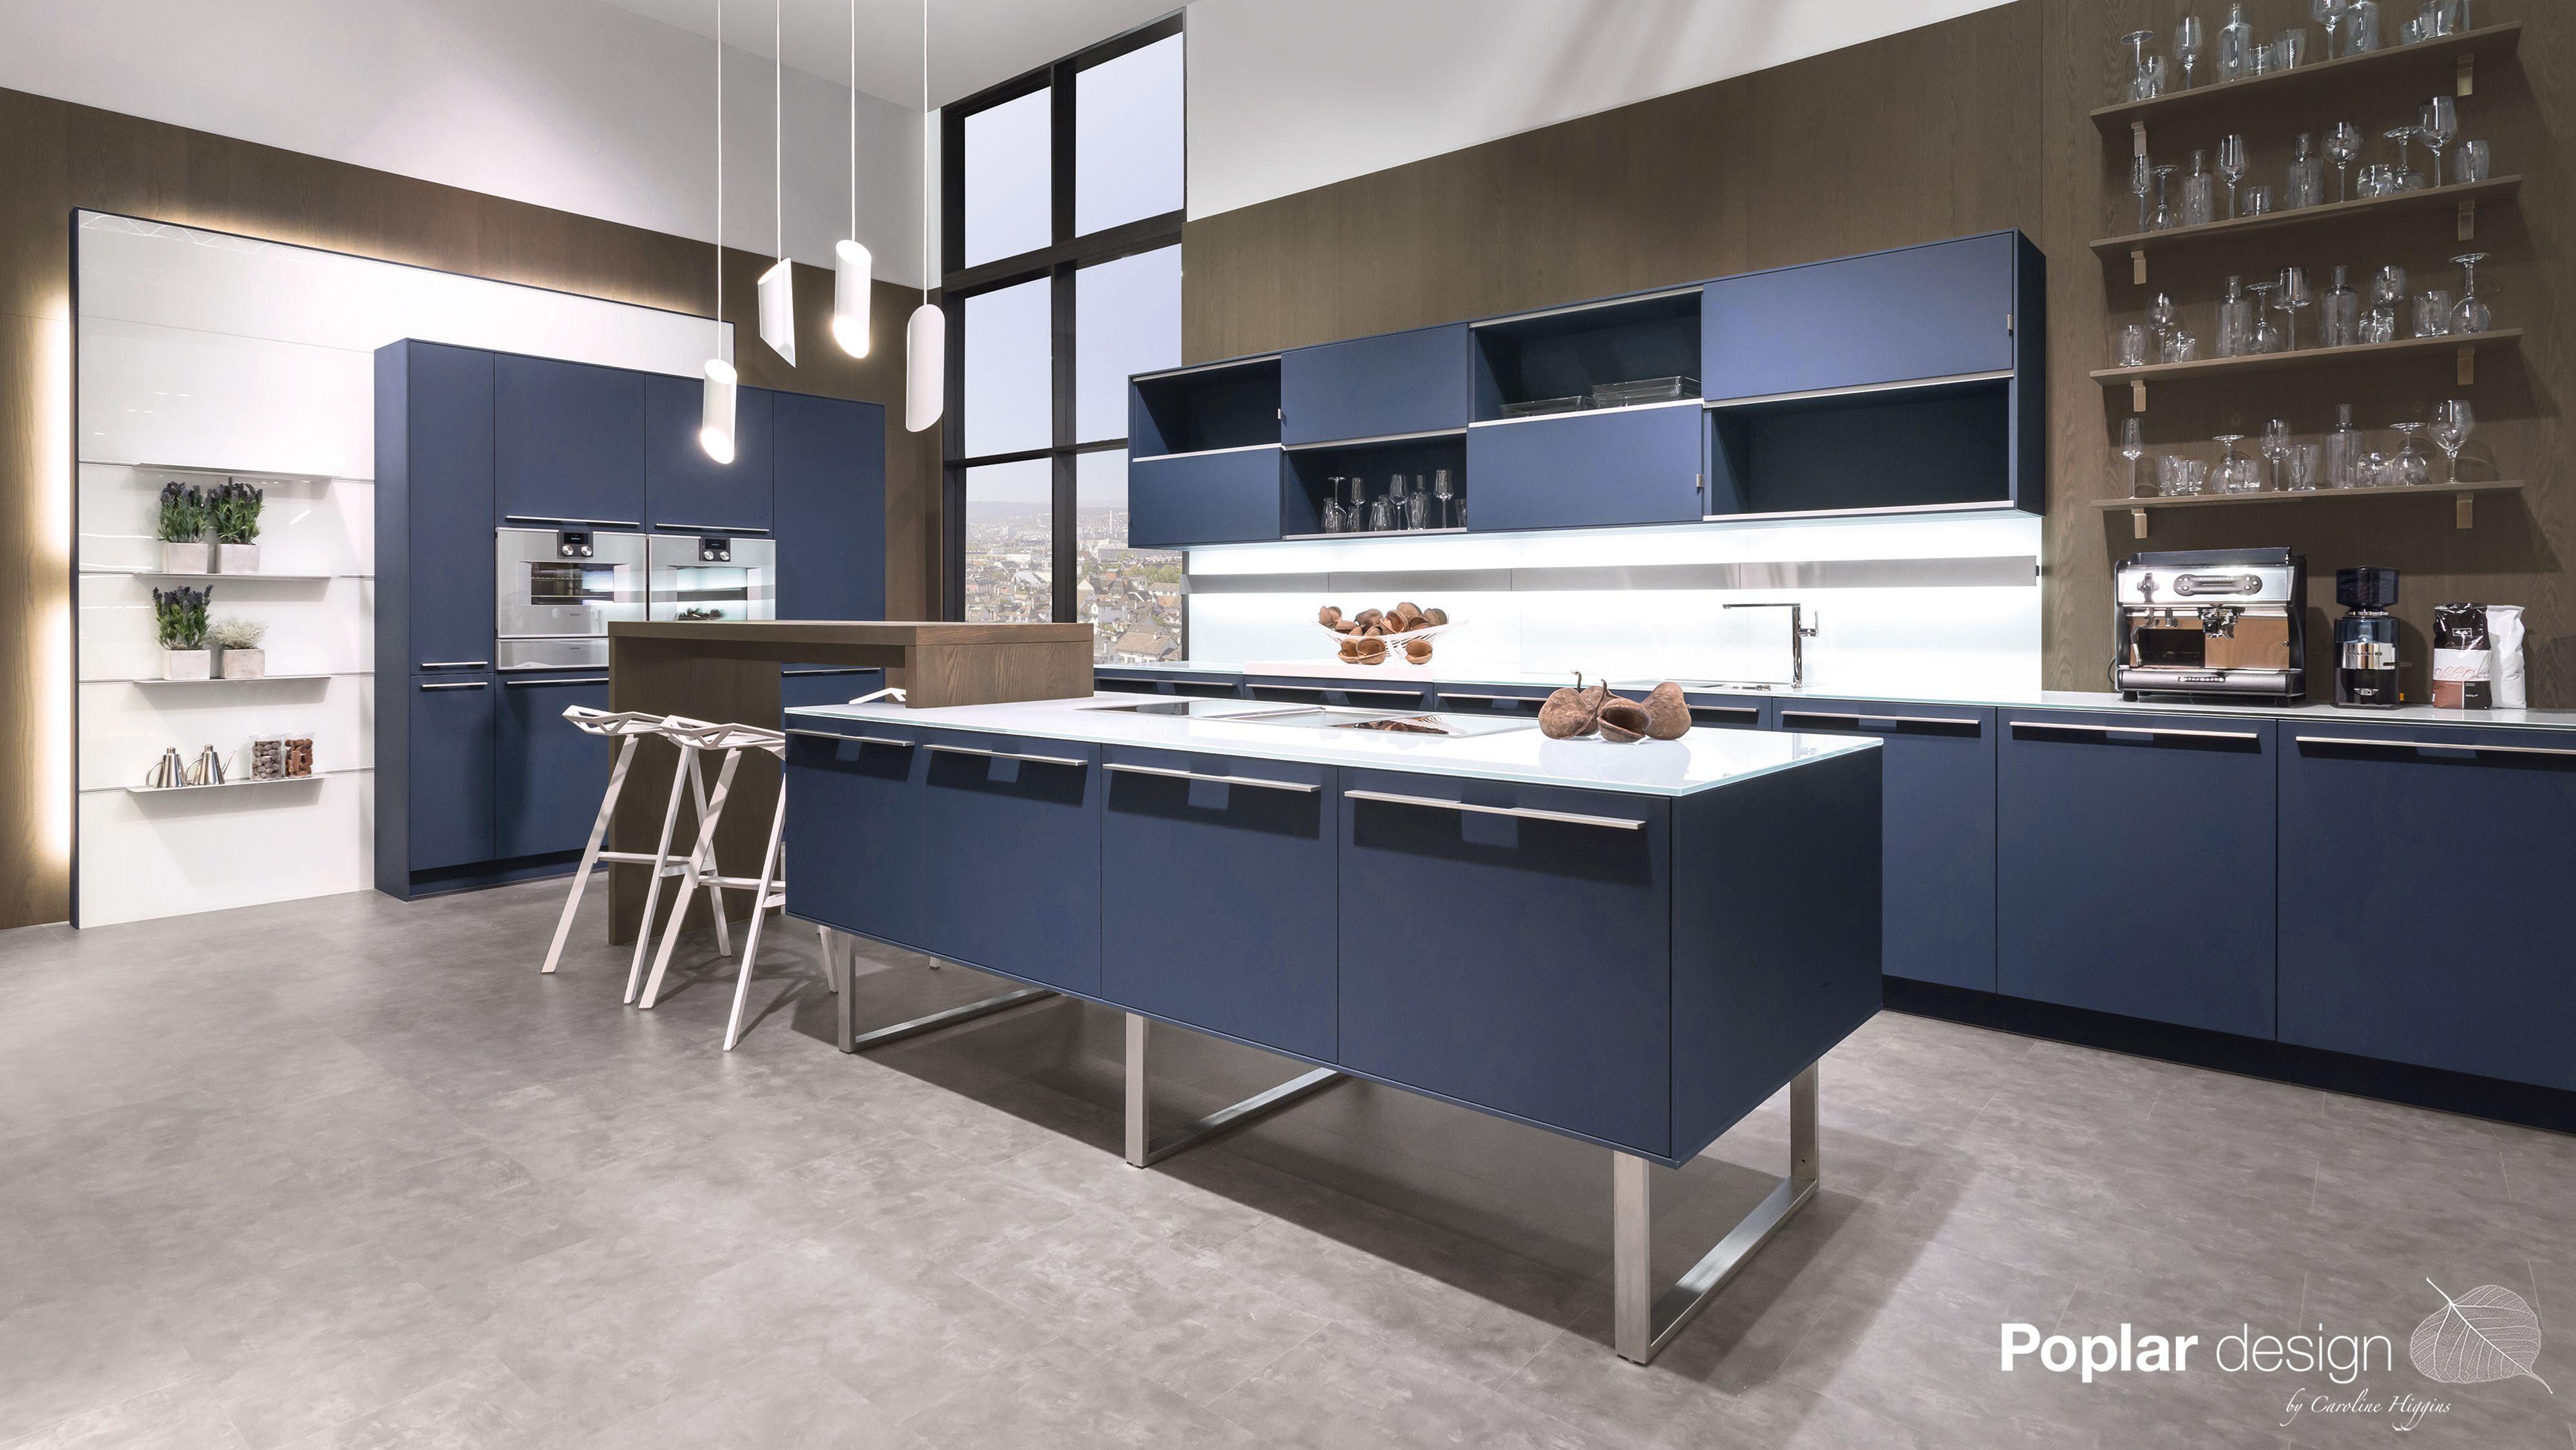 küchenplana frisch abbild der bccffdddbfcfdeddb jpg